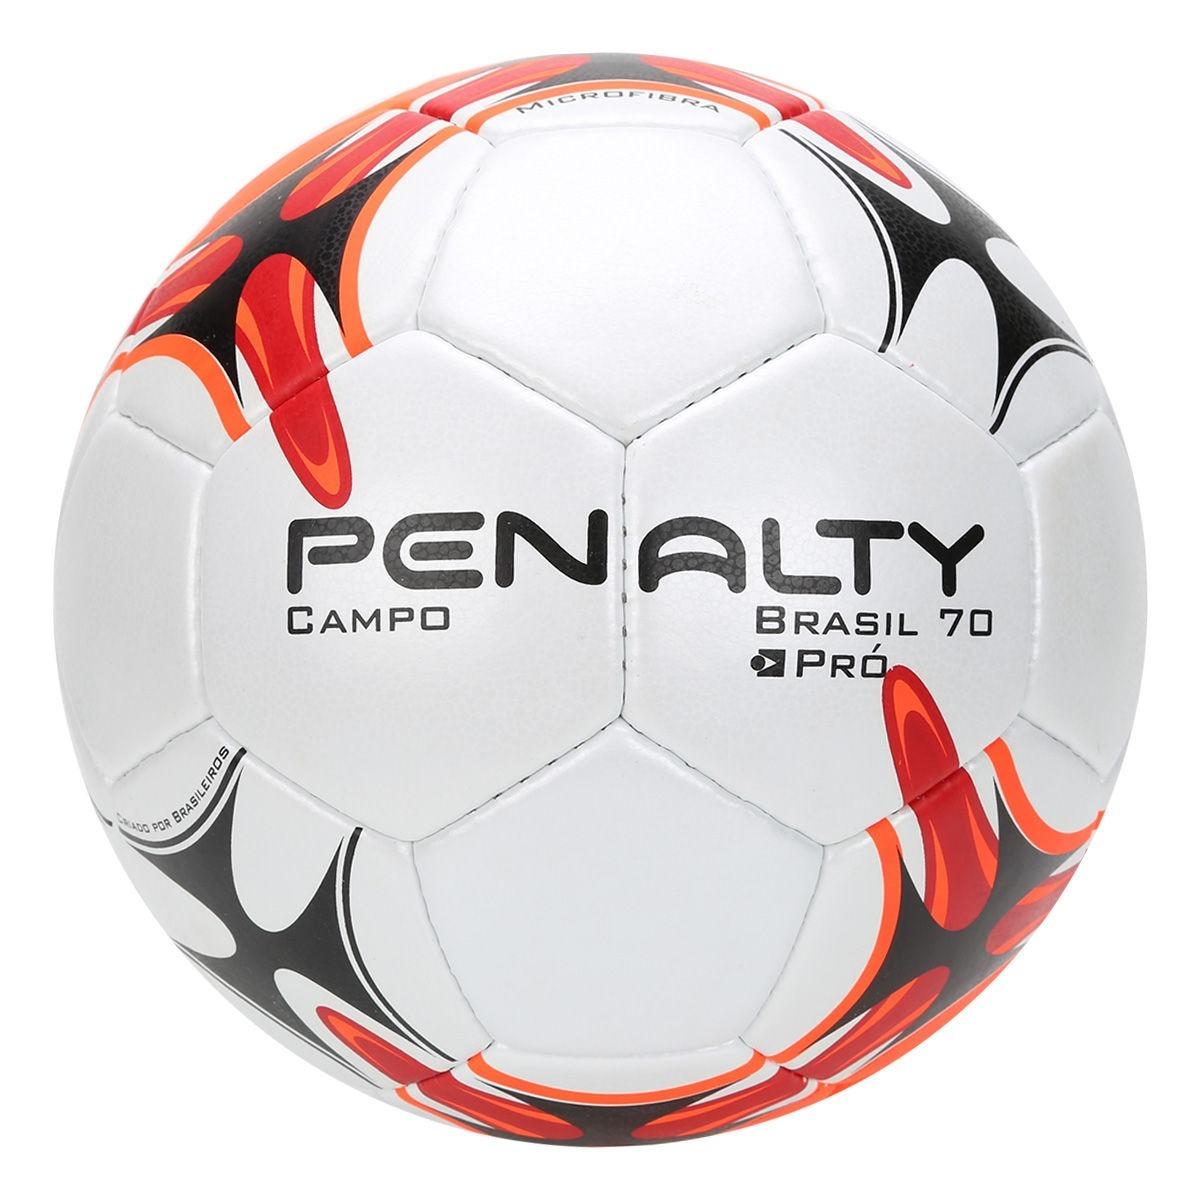 bola penalty futebol de campo brasil 70 profissional 1magnus. Carregando  zoom. 9fcd0775b9454